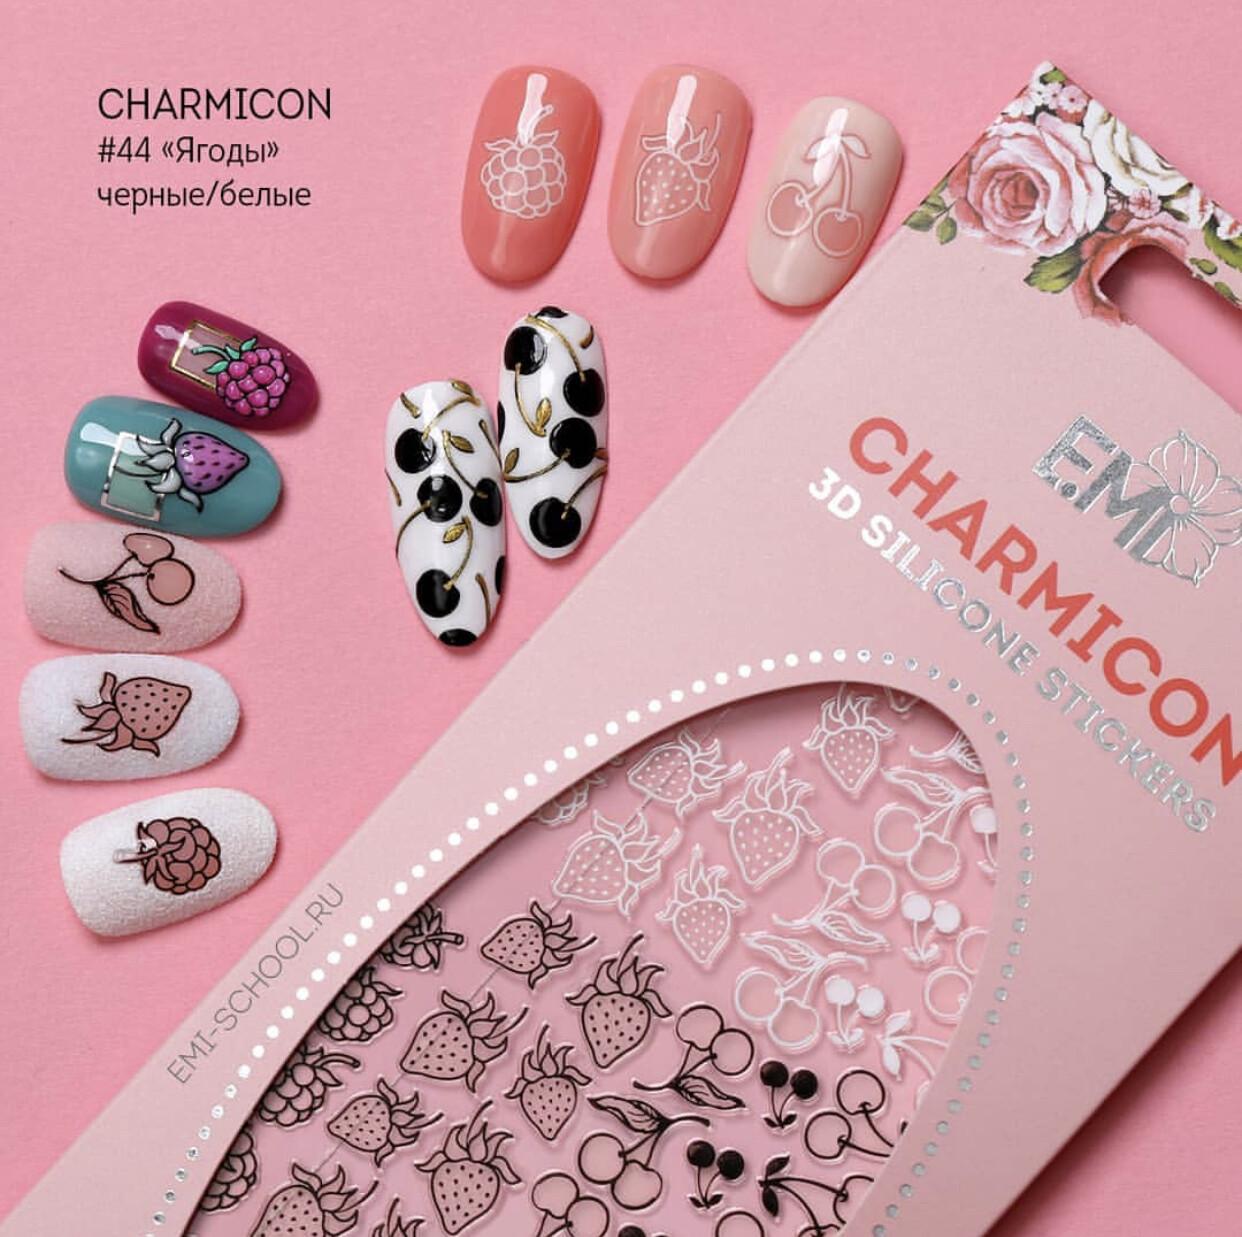 Charmicon Silicone Stickers #44 Berries Black/White